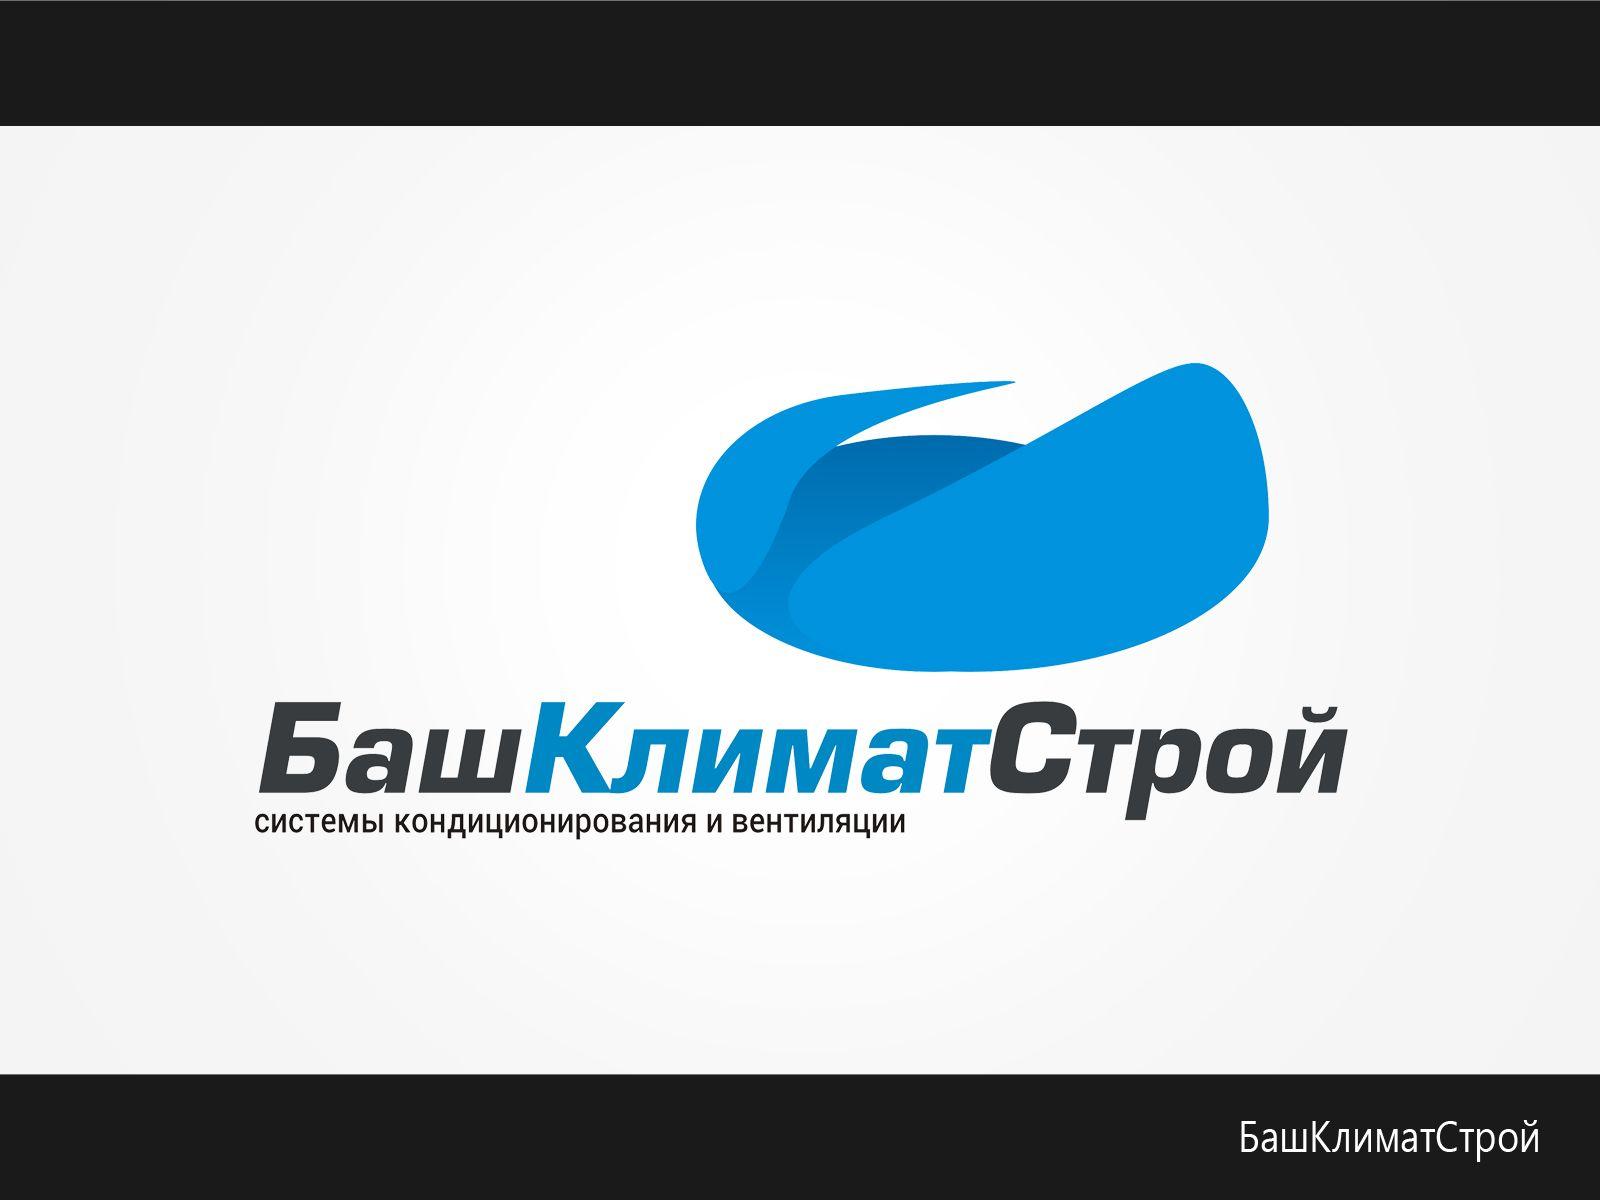 Конкурс на логотип сайта - дизайнер bonvian